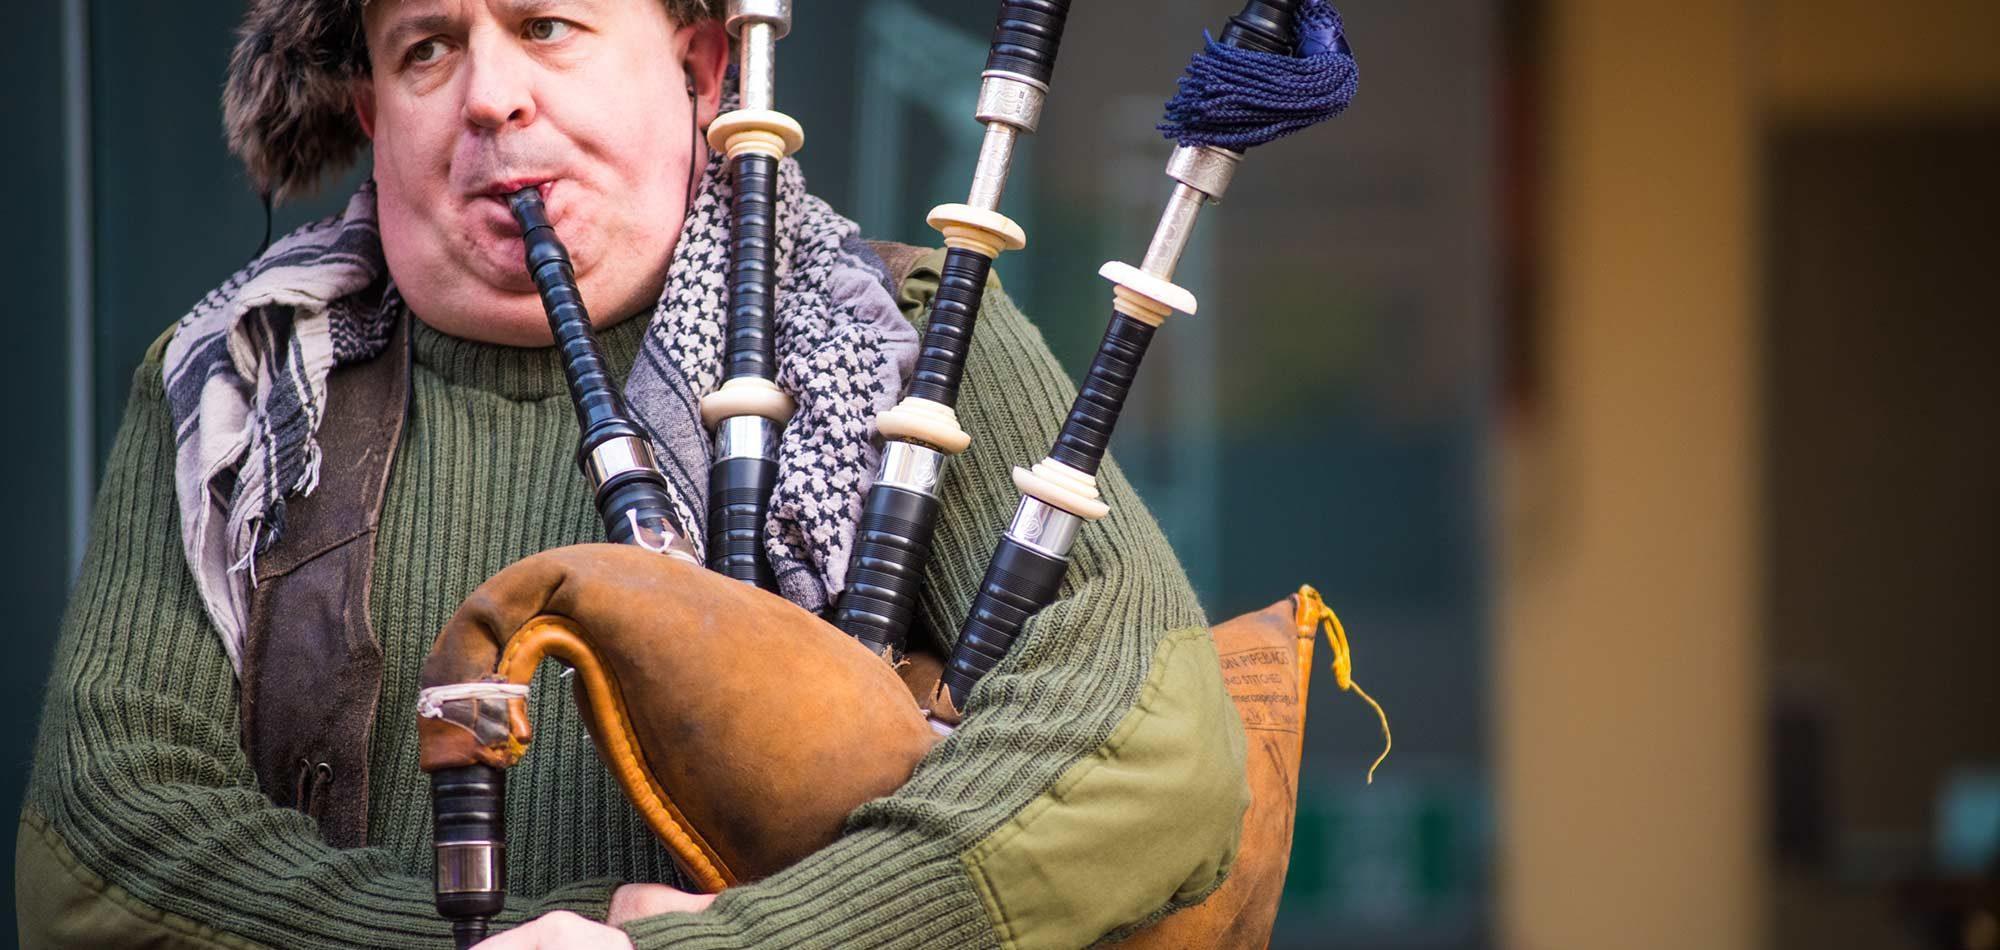 bagpipe scotland roadtrip sir edwards